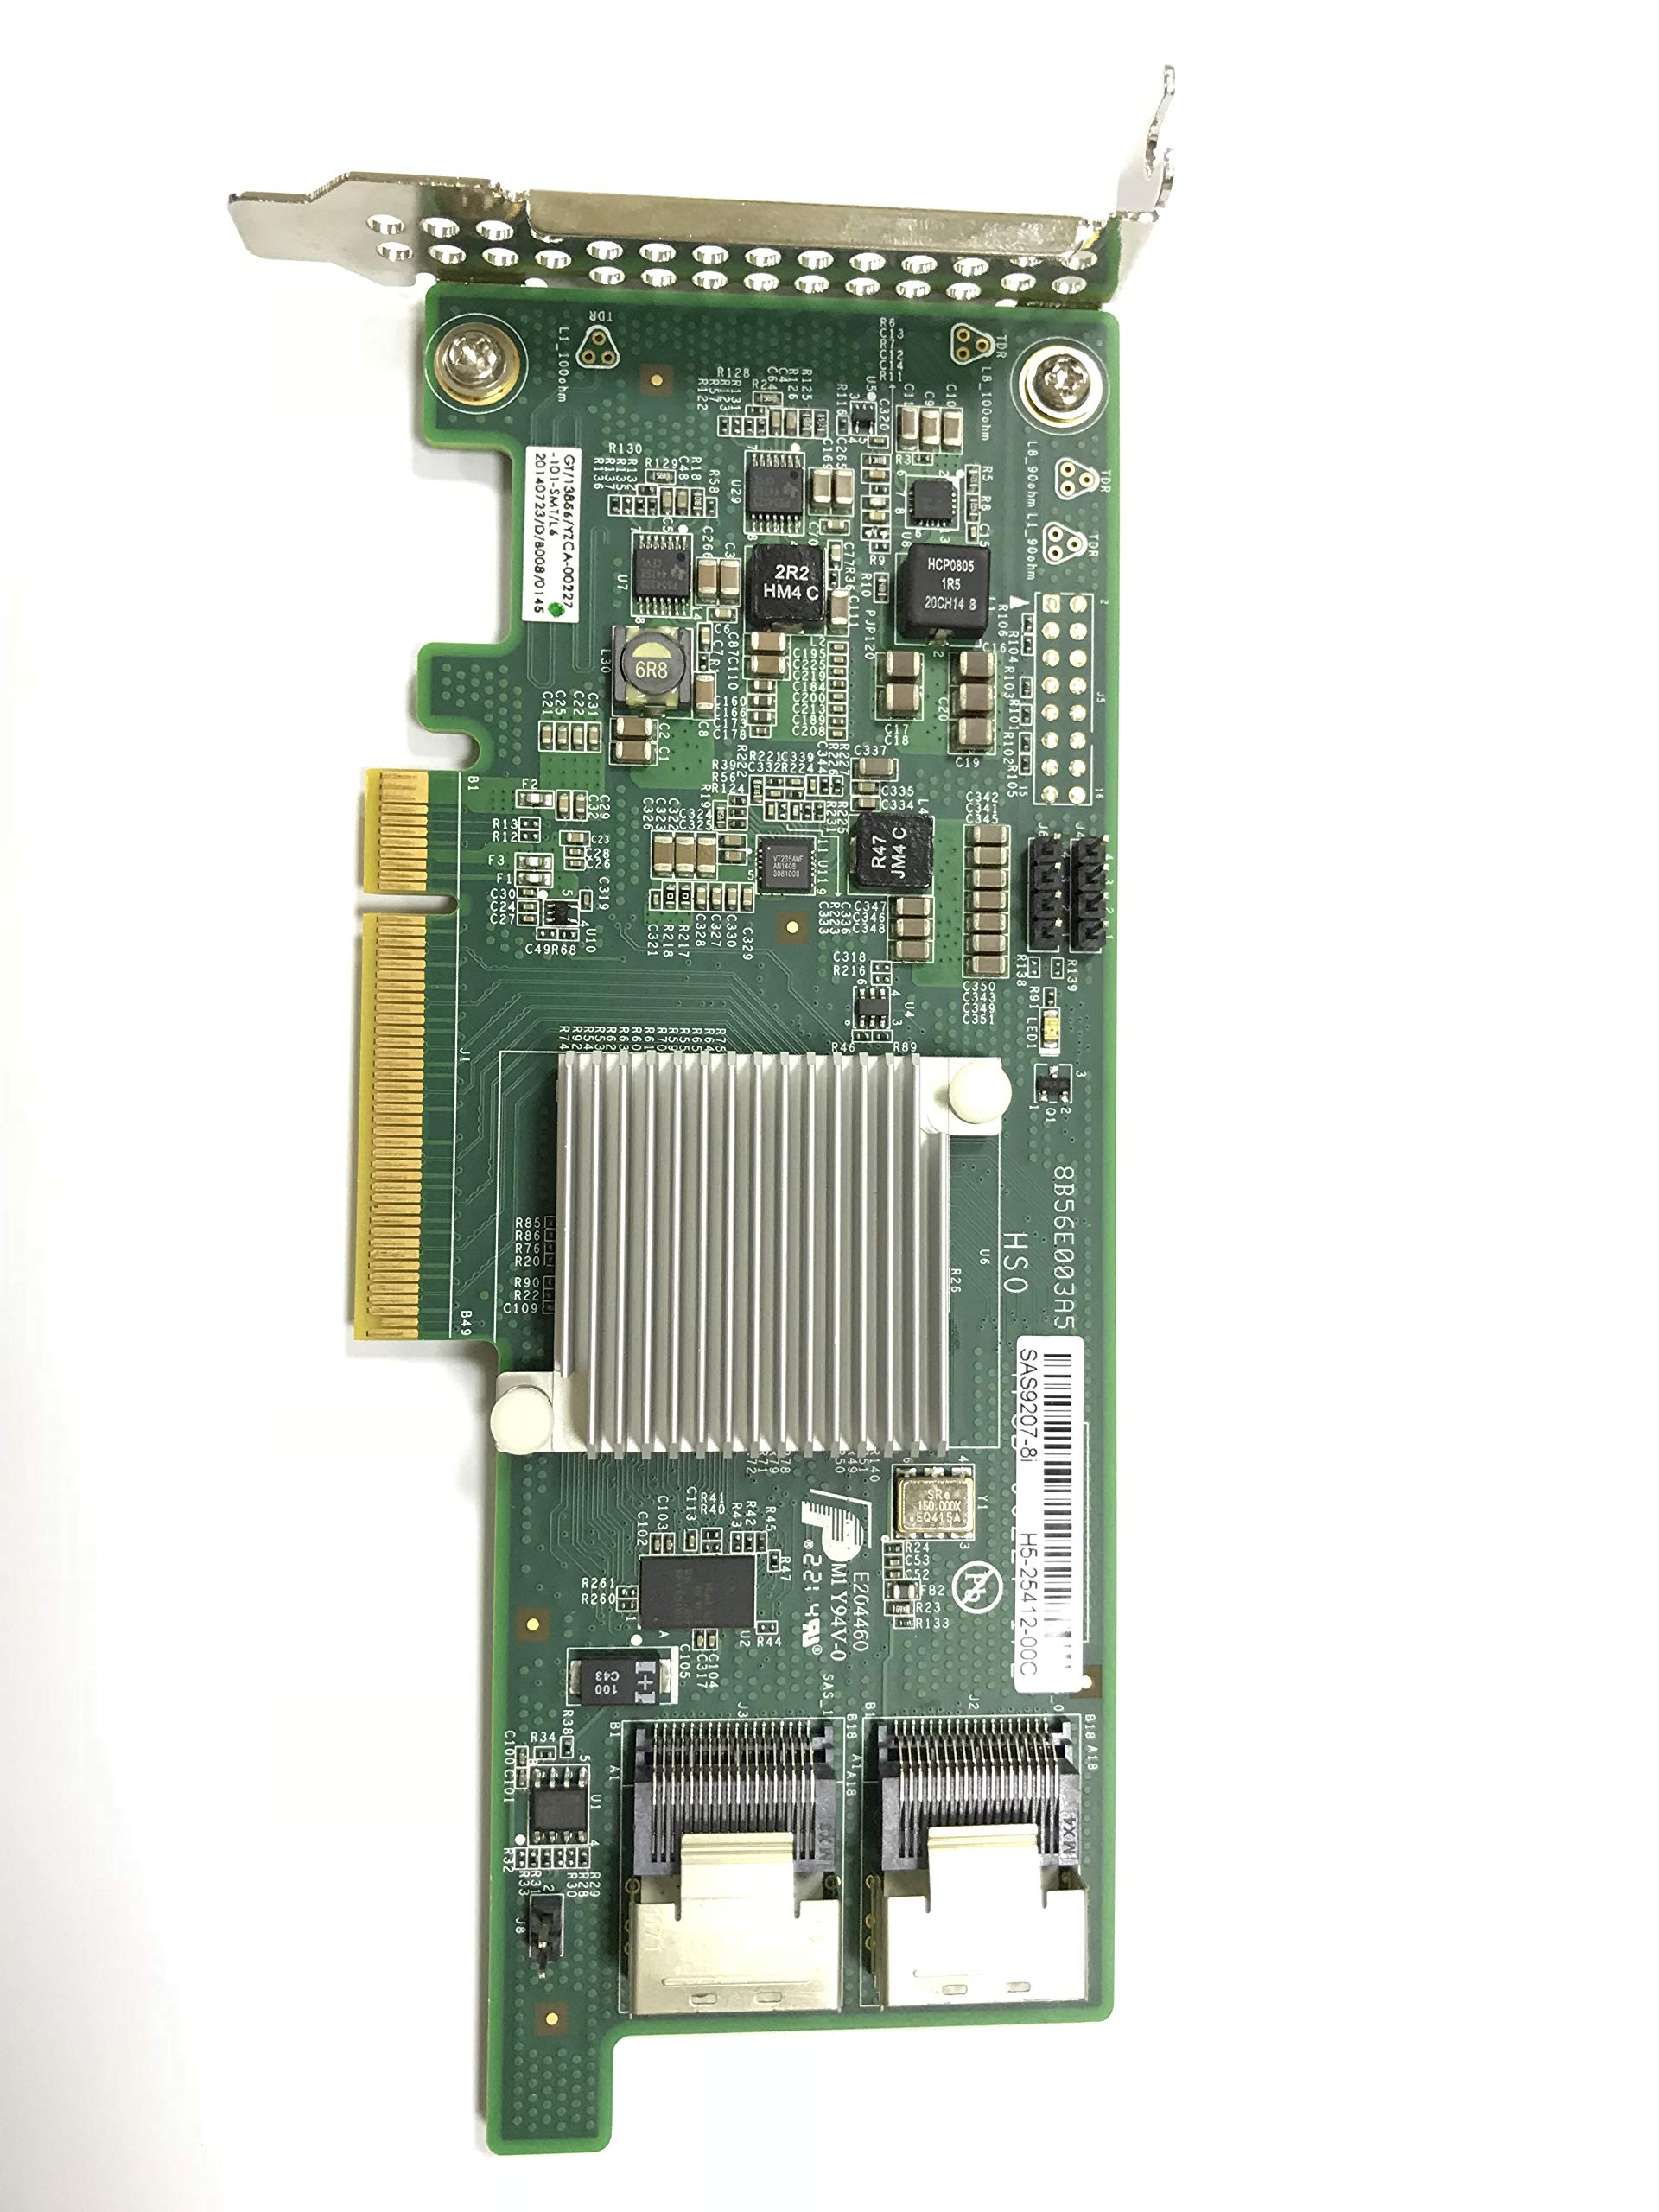 MFU SAS 9207-8i 8-Port 6Gb/s SAS+SATA to PCI Express 2.0 Host Bus Adapter by MFU (Image #1)